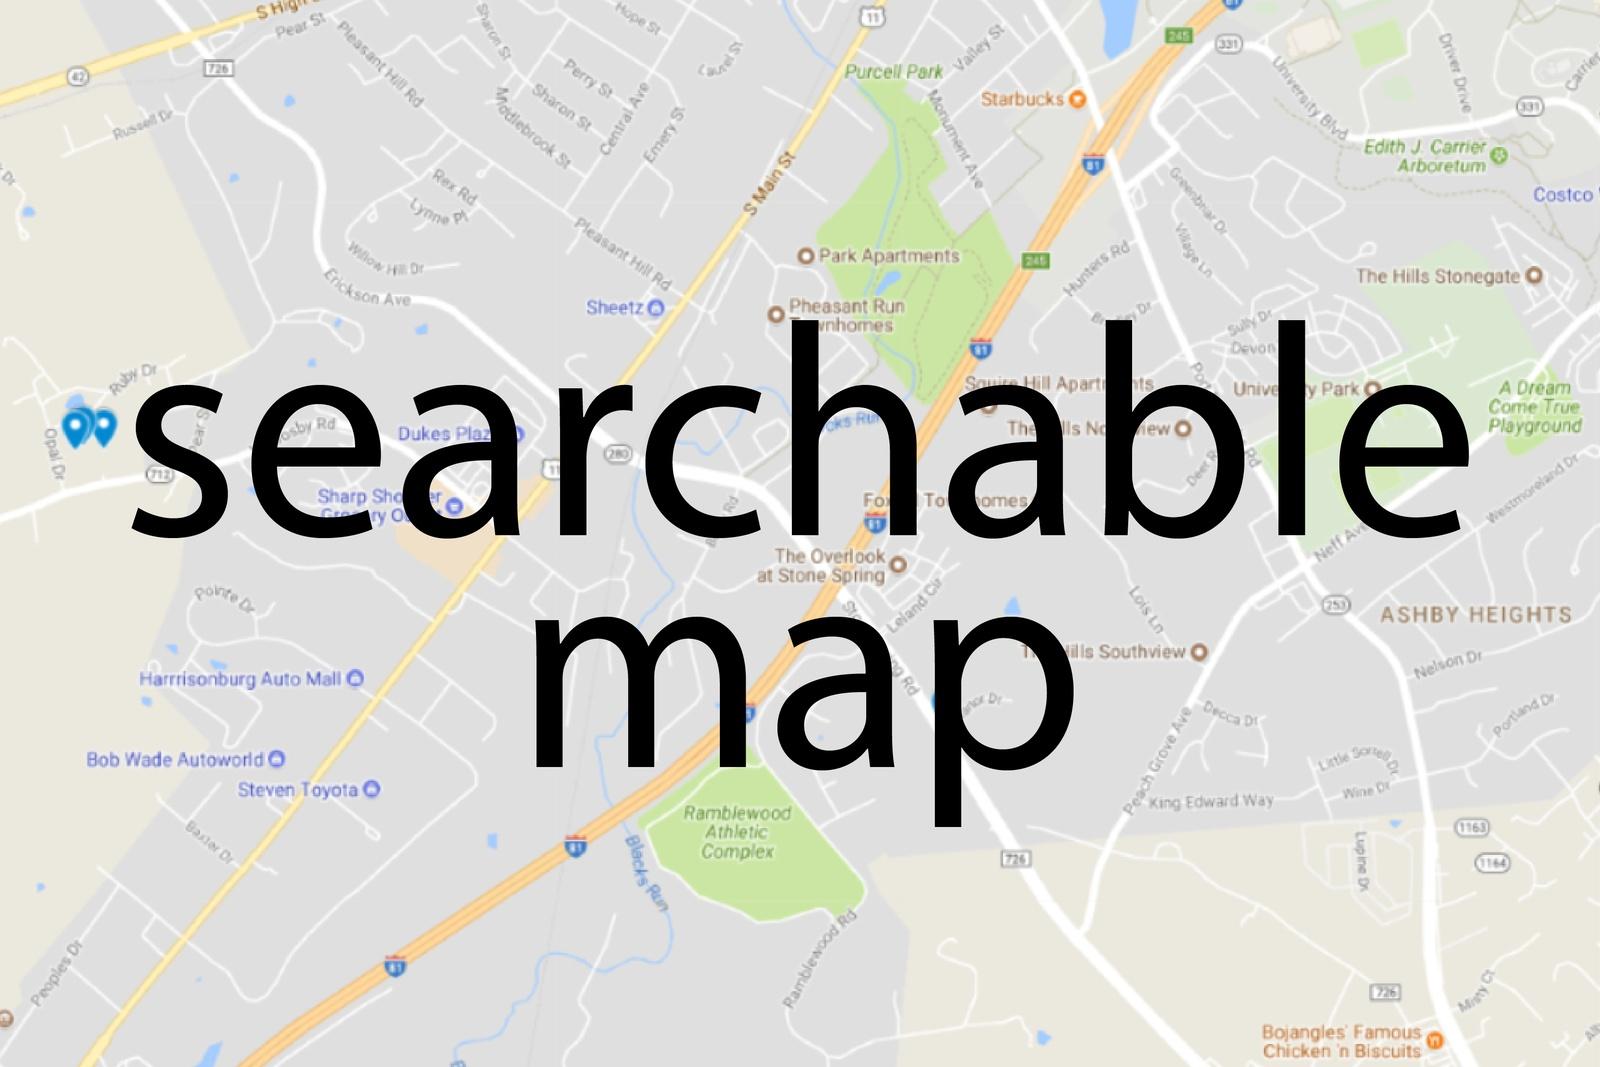 hg map-01-01